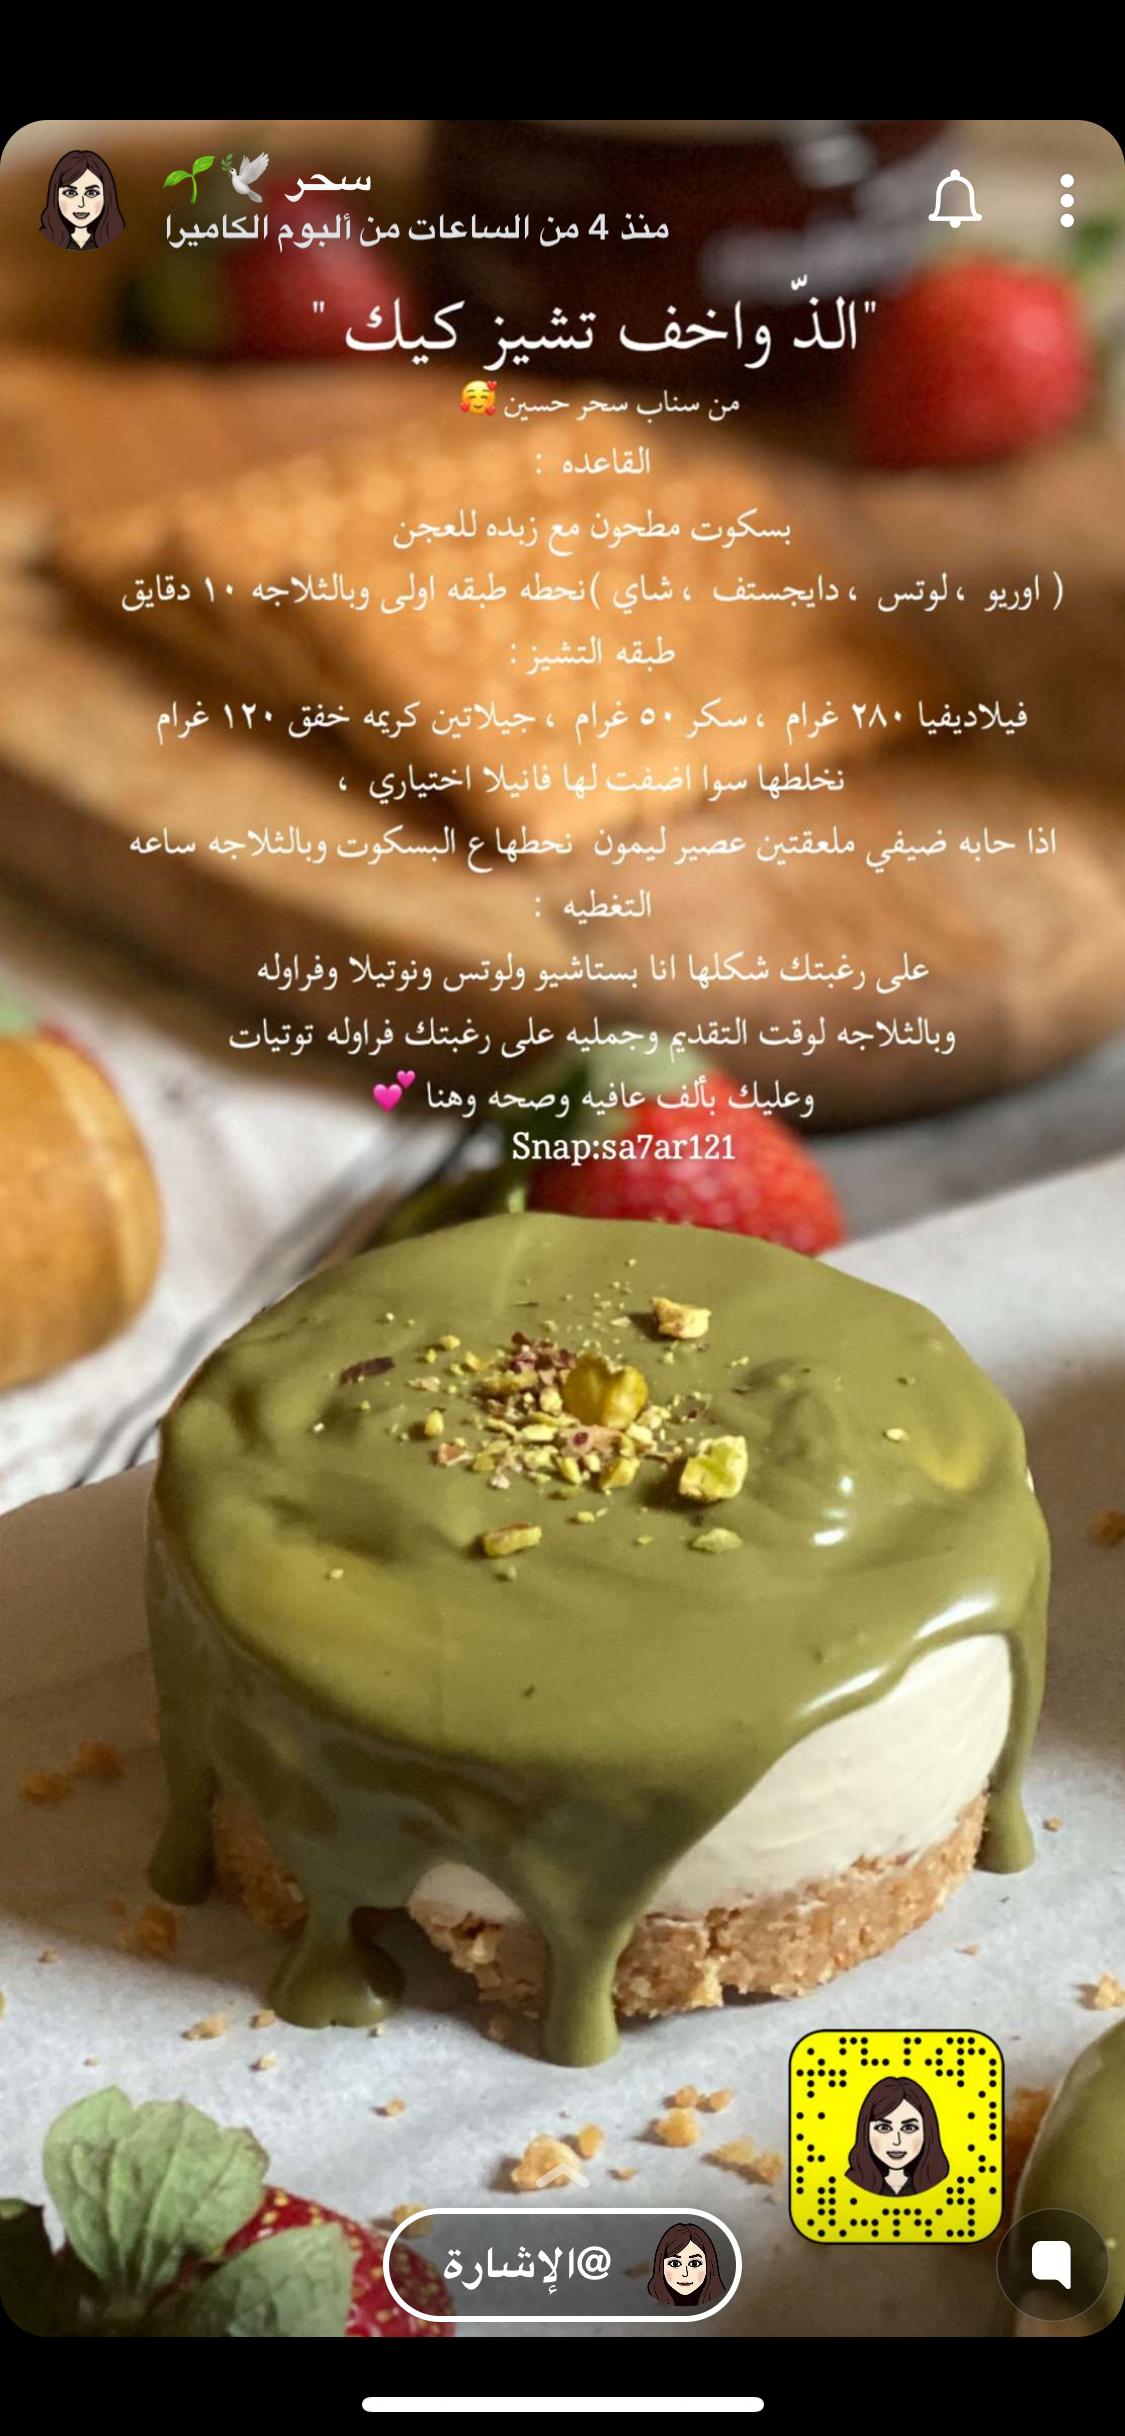 Pin By Bnt Almalki On اطباق سهلة وسريعة للمناسبات Yummy Food Dessert Dessert Recipes Yummy Food